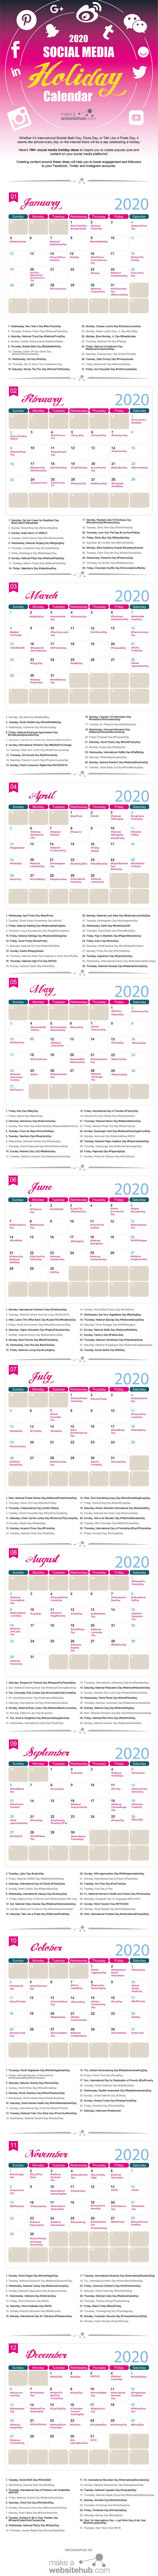 The 2020 Social Media Holiday Calendar Make A Website Hub